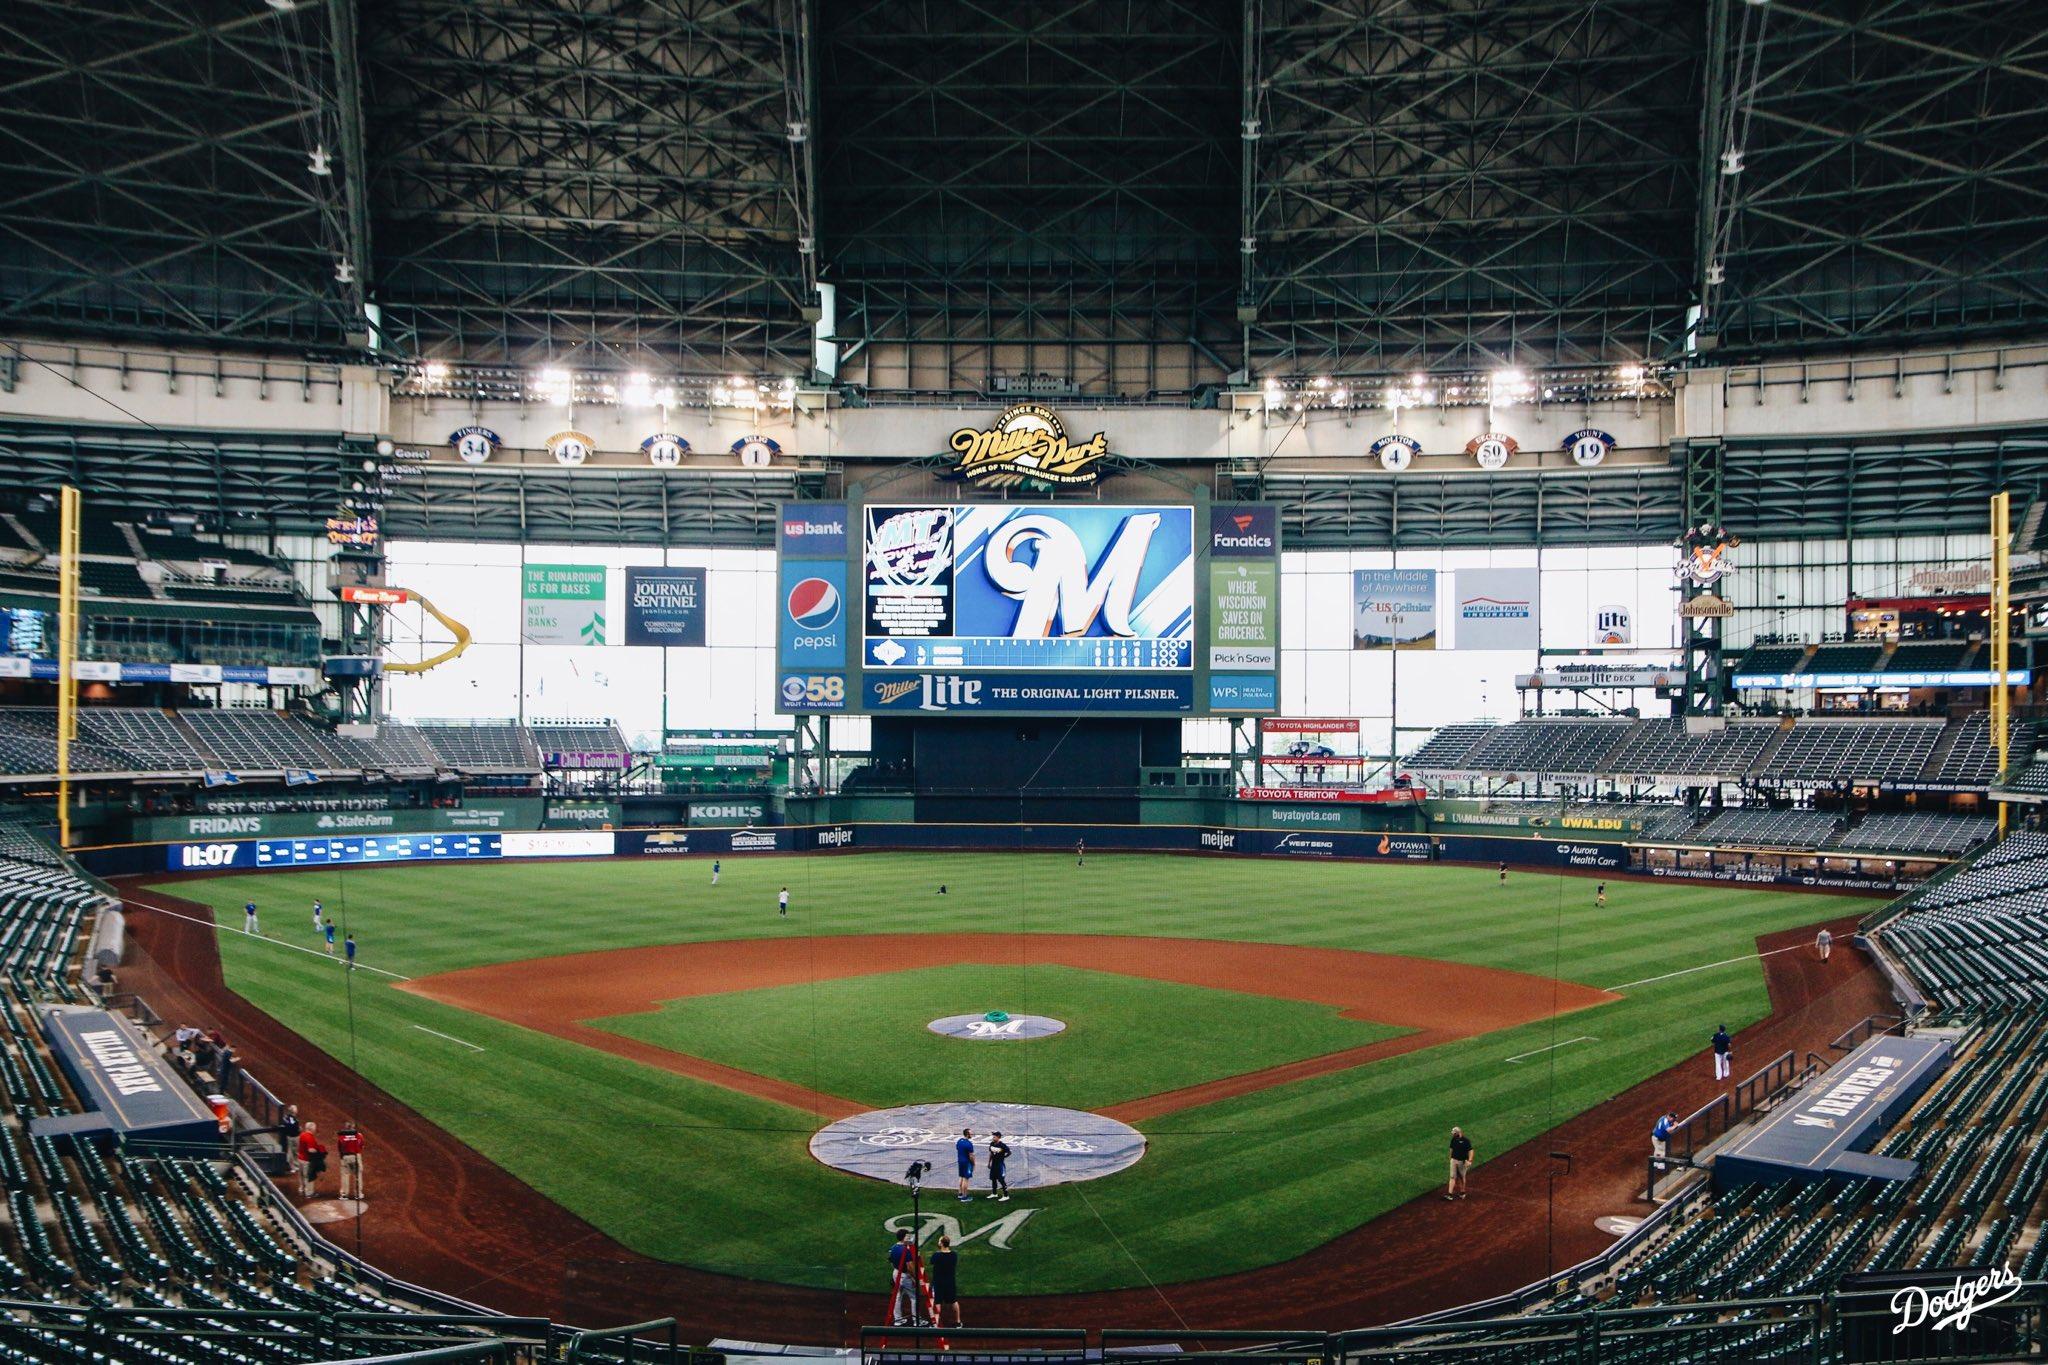 Last one in Milwaukee. #Dodgers https://t.co/apkuNdb5qI